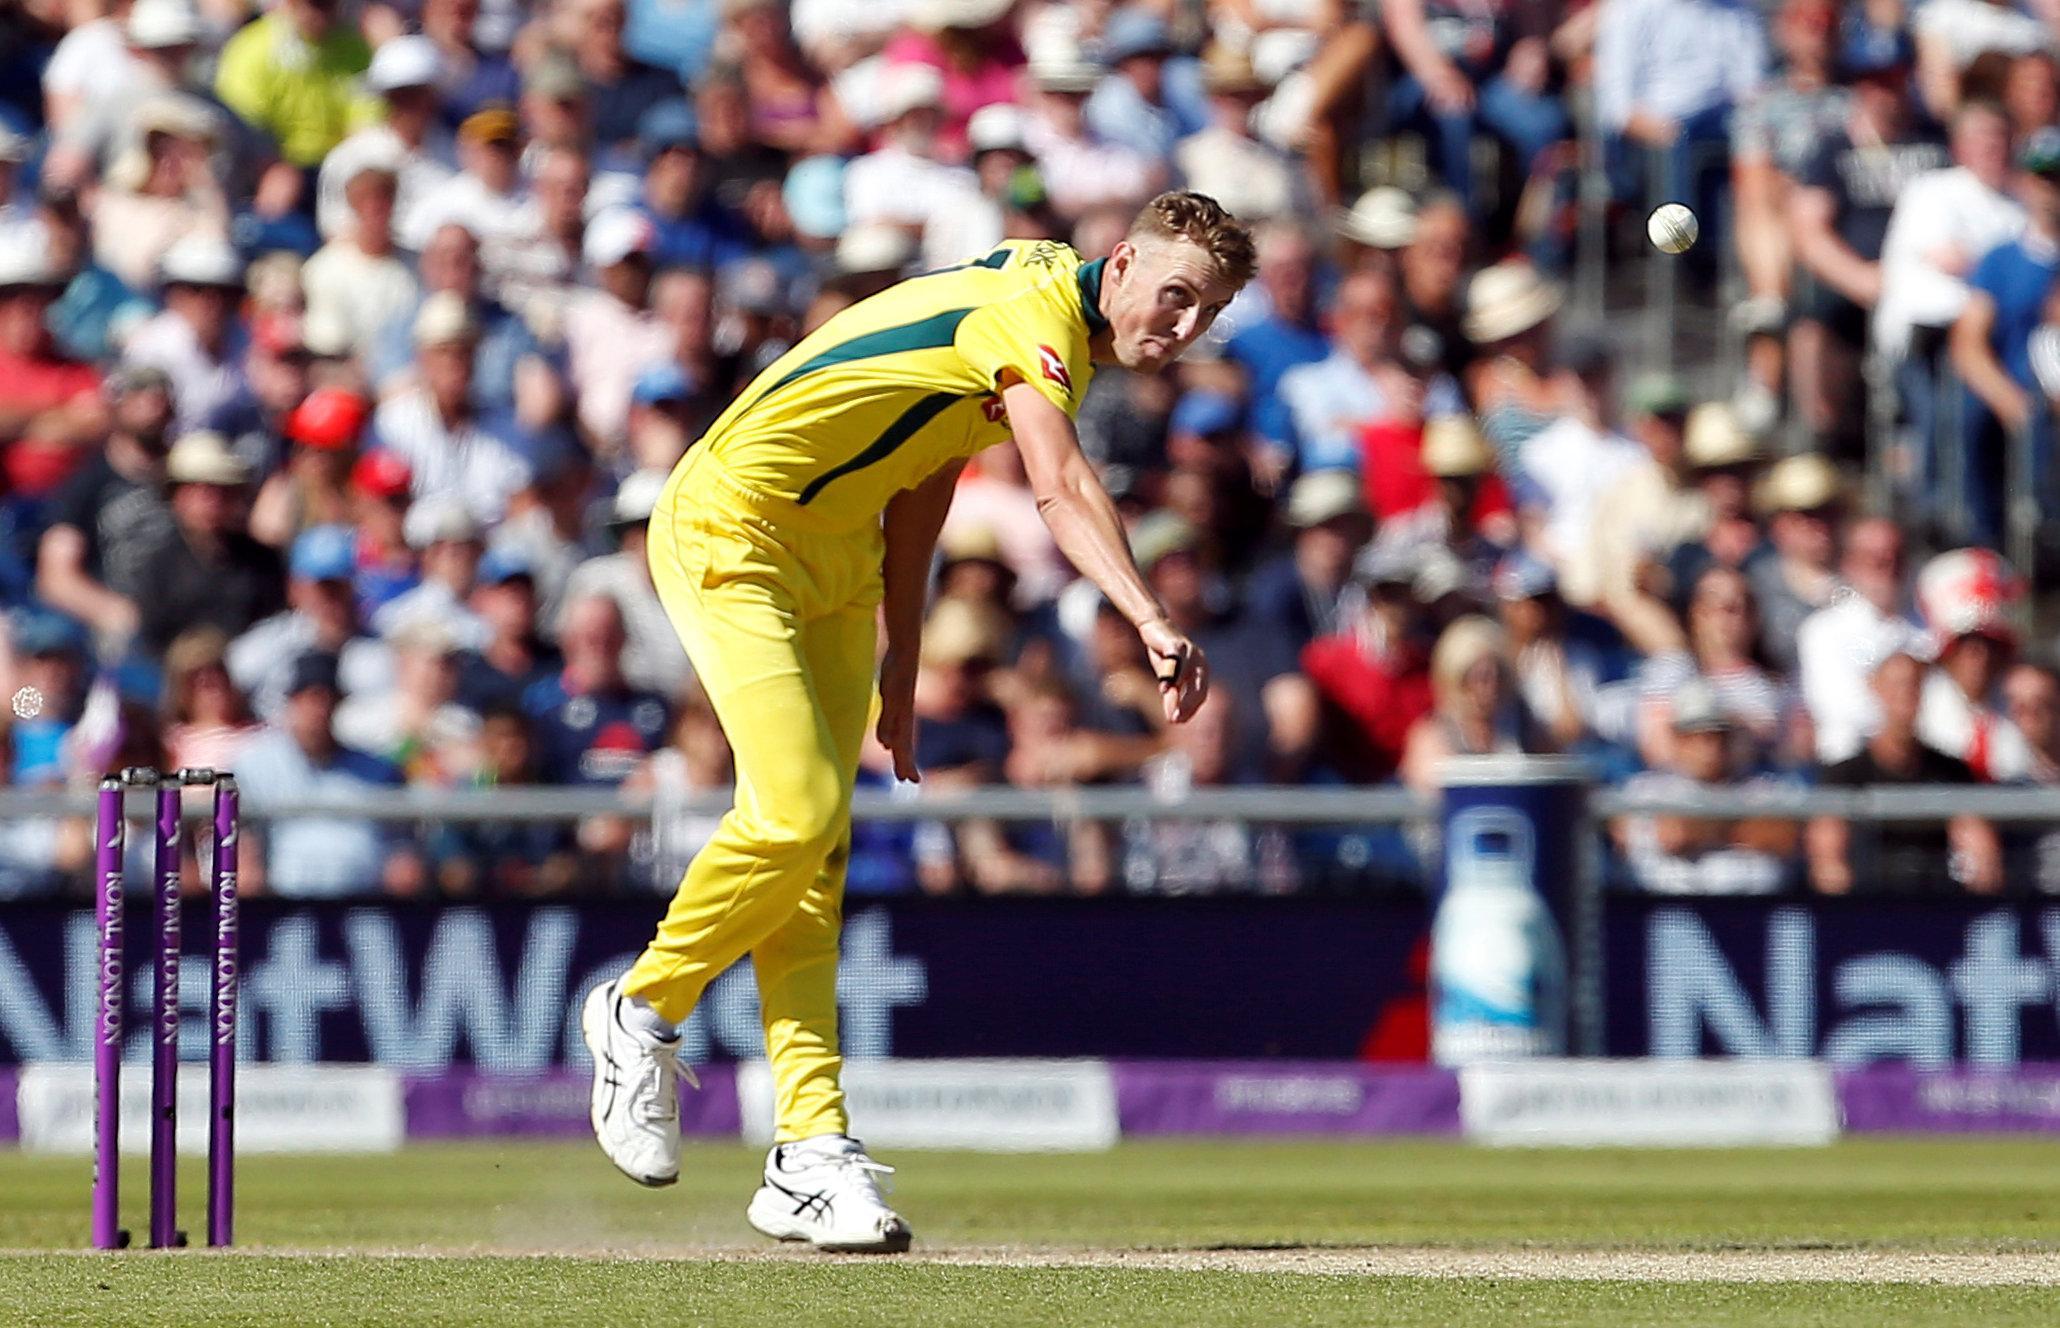 Billy Stanlake took 3-35 as Australia finally found a way through the England top order